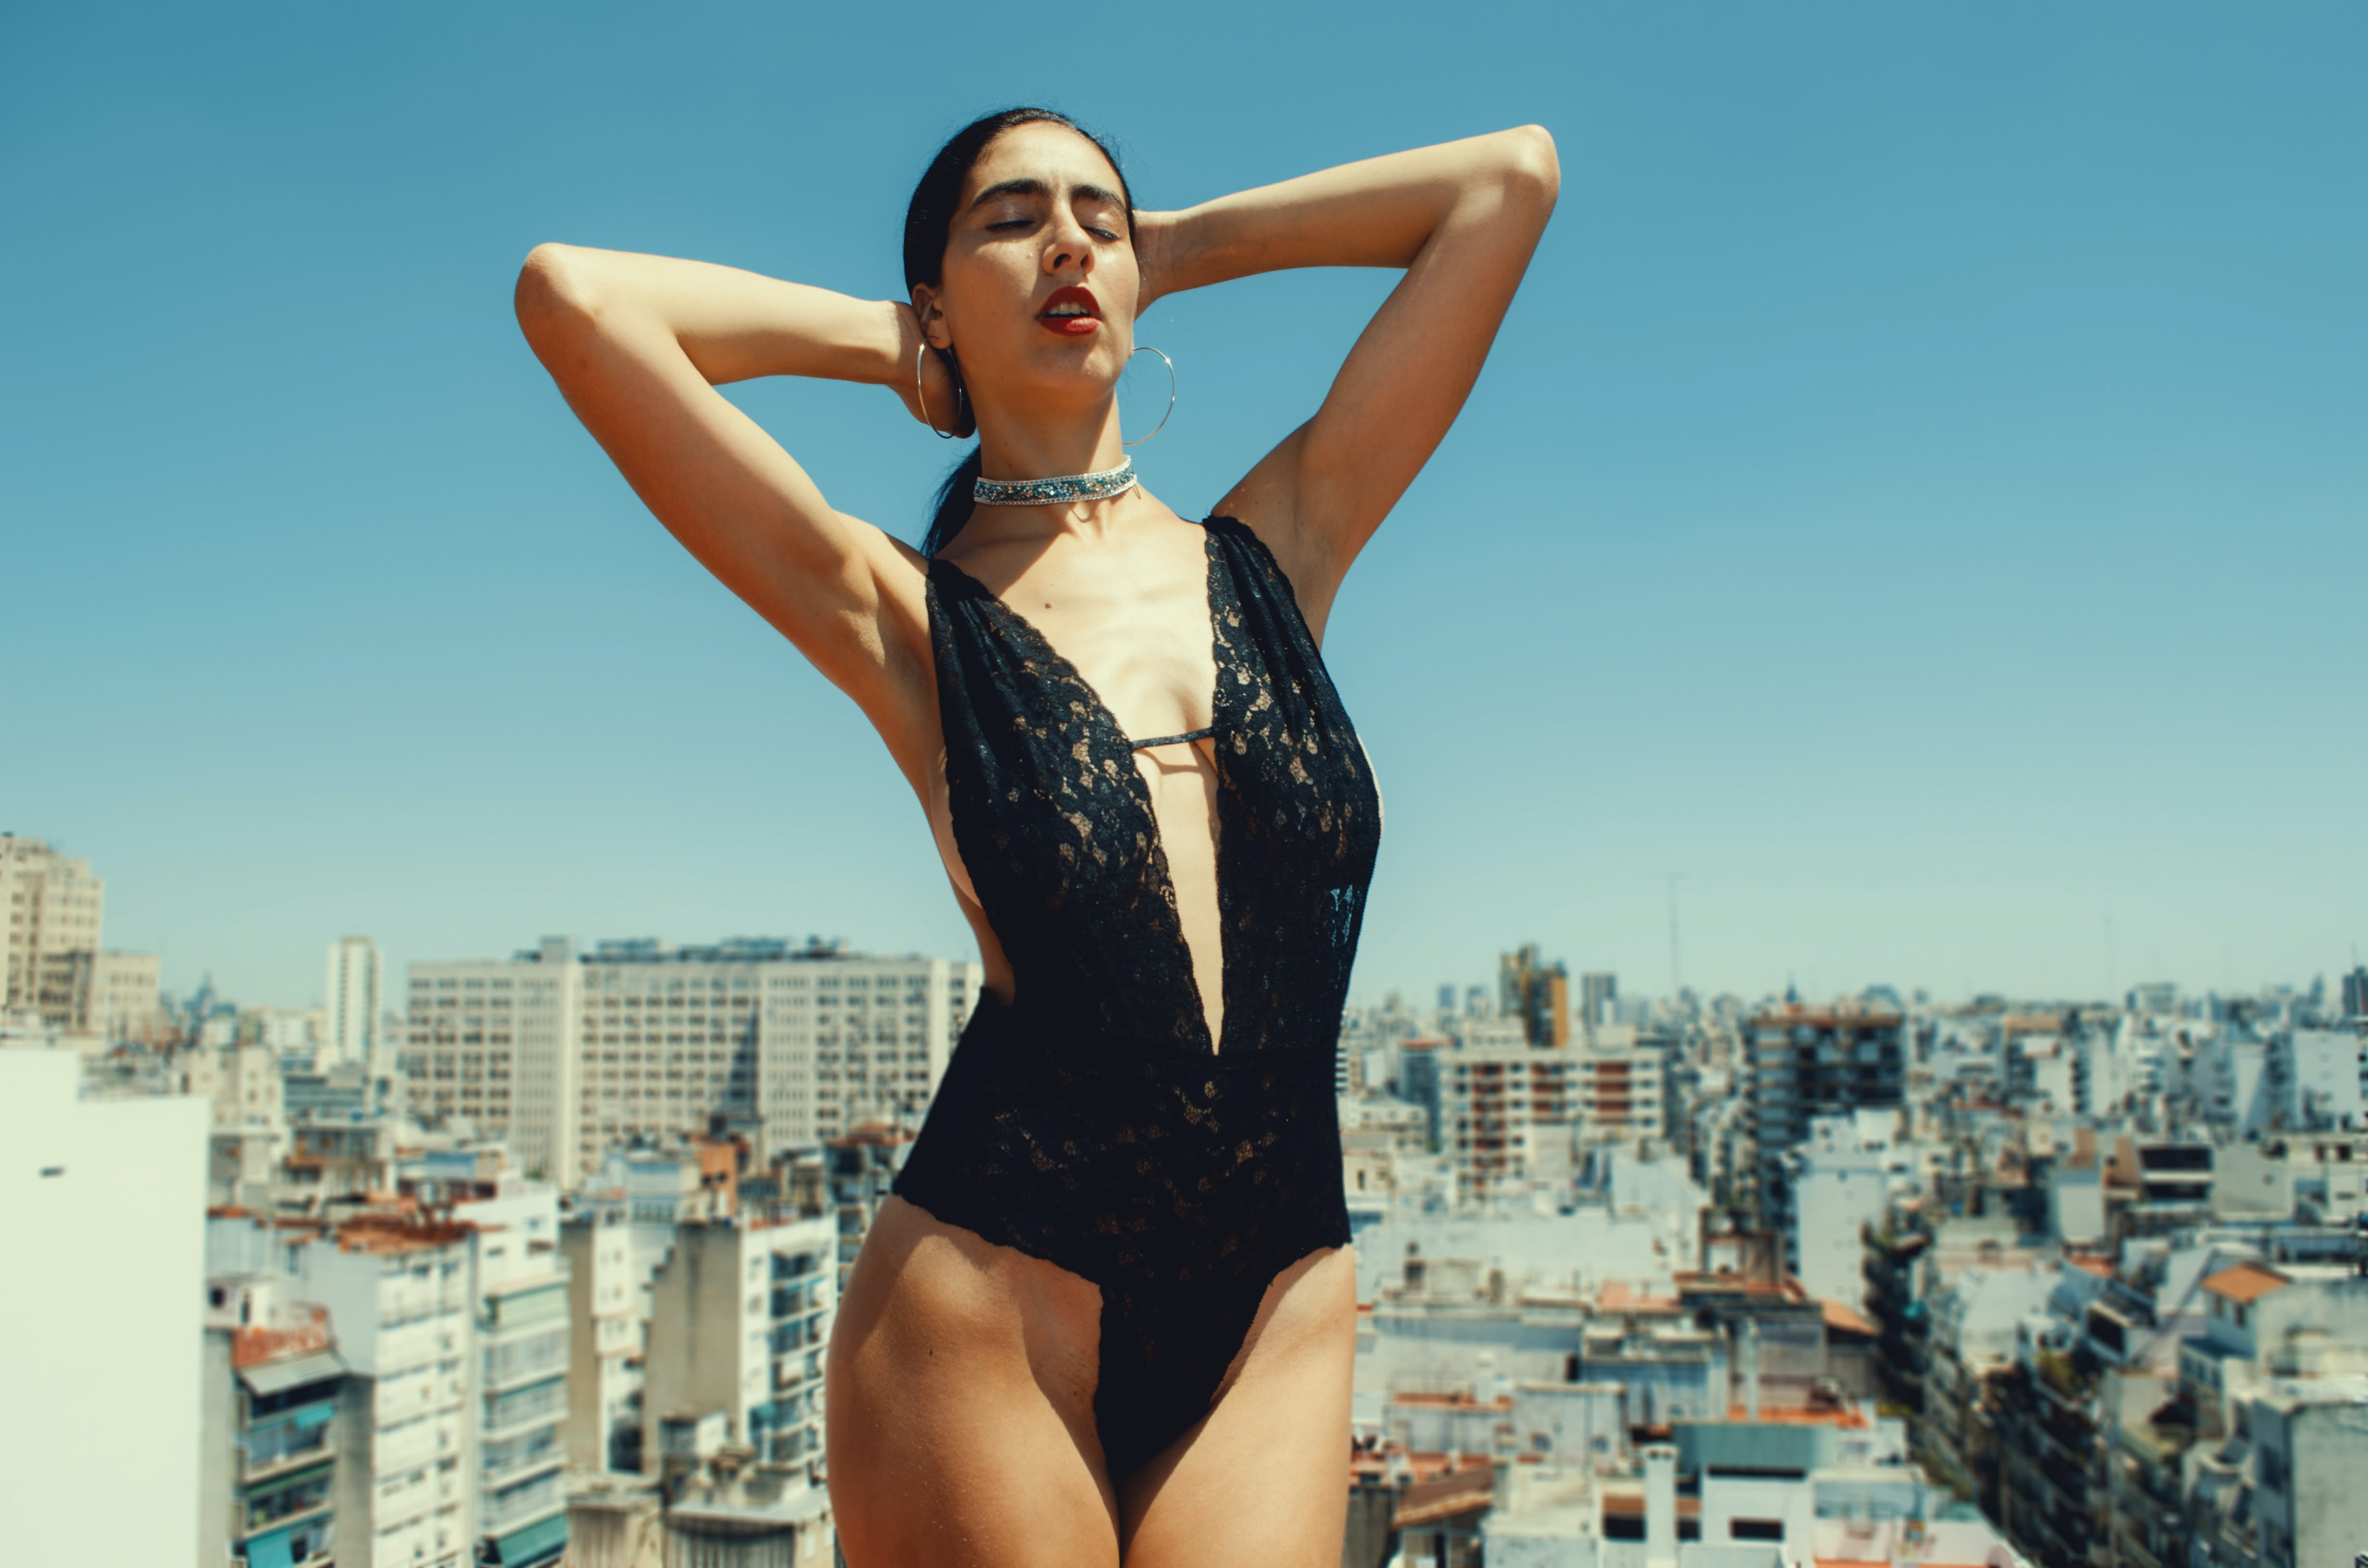 Woman in Black One-piece Swimsuit Under Blue Sky